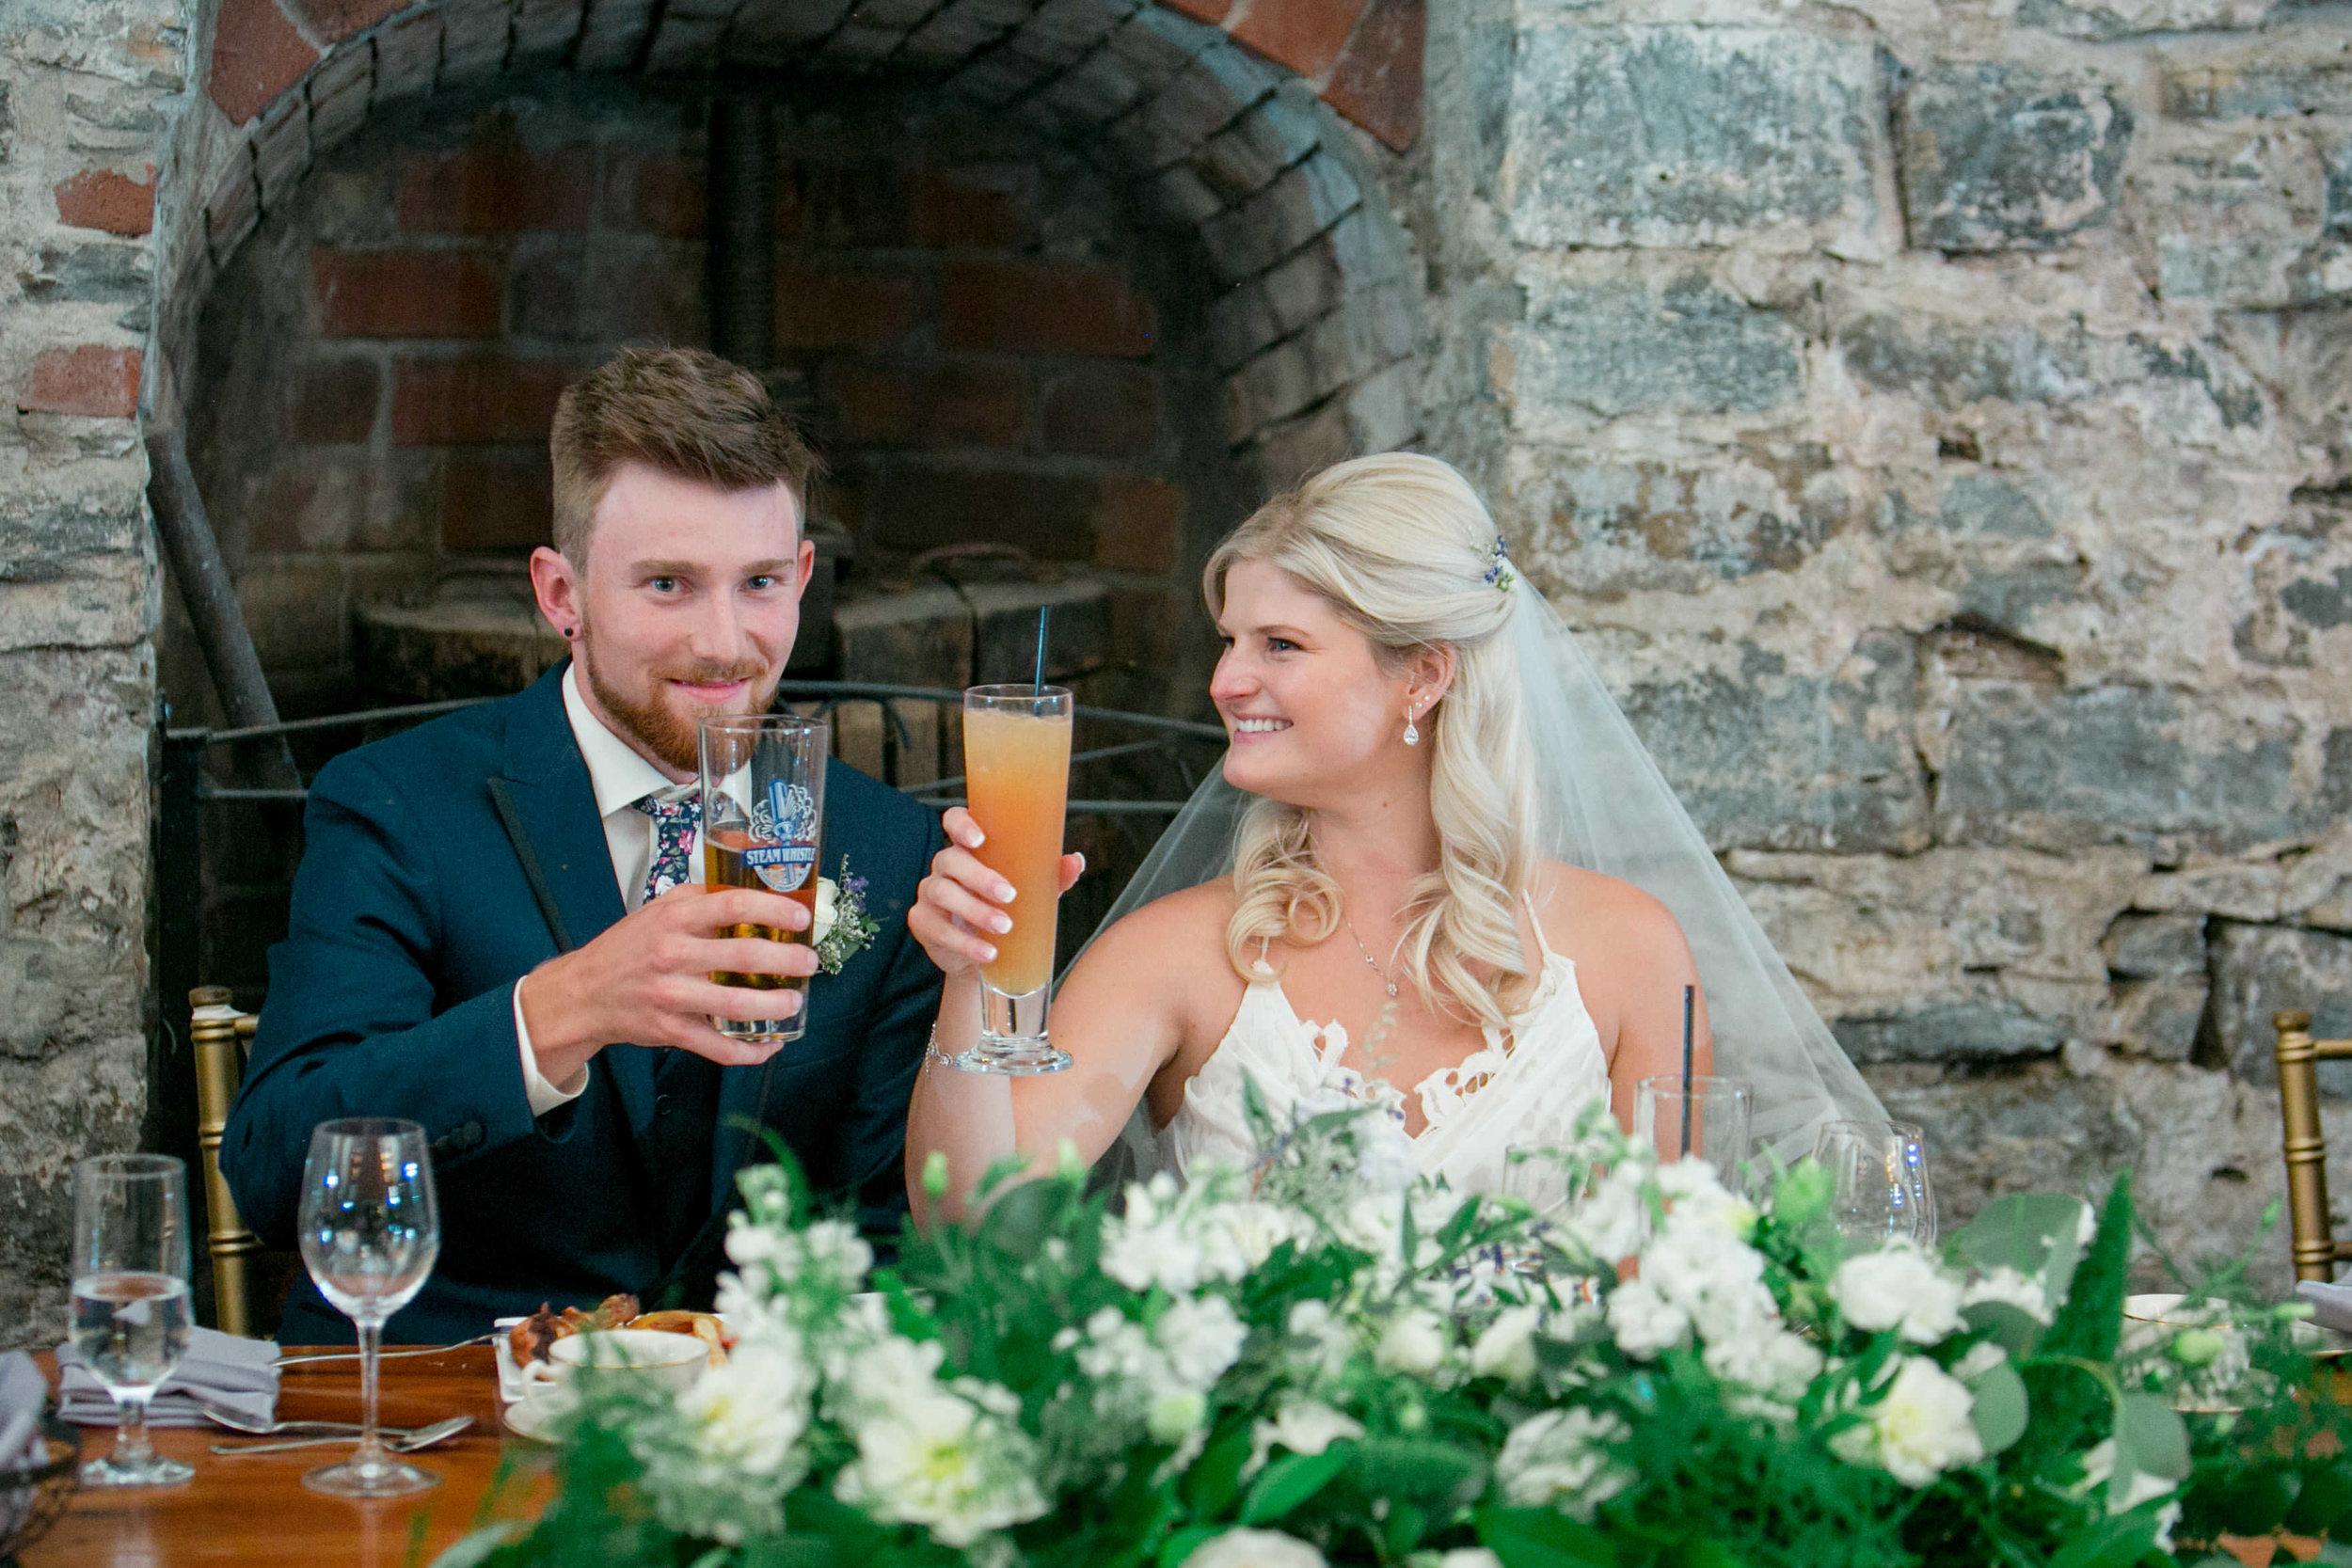 Maddy___Brandon___Daniel_Ricci_Weddings_High_Res._Finals_569.jpg